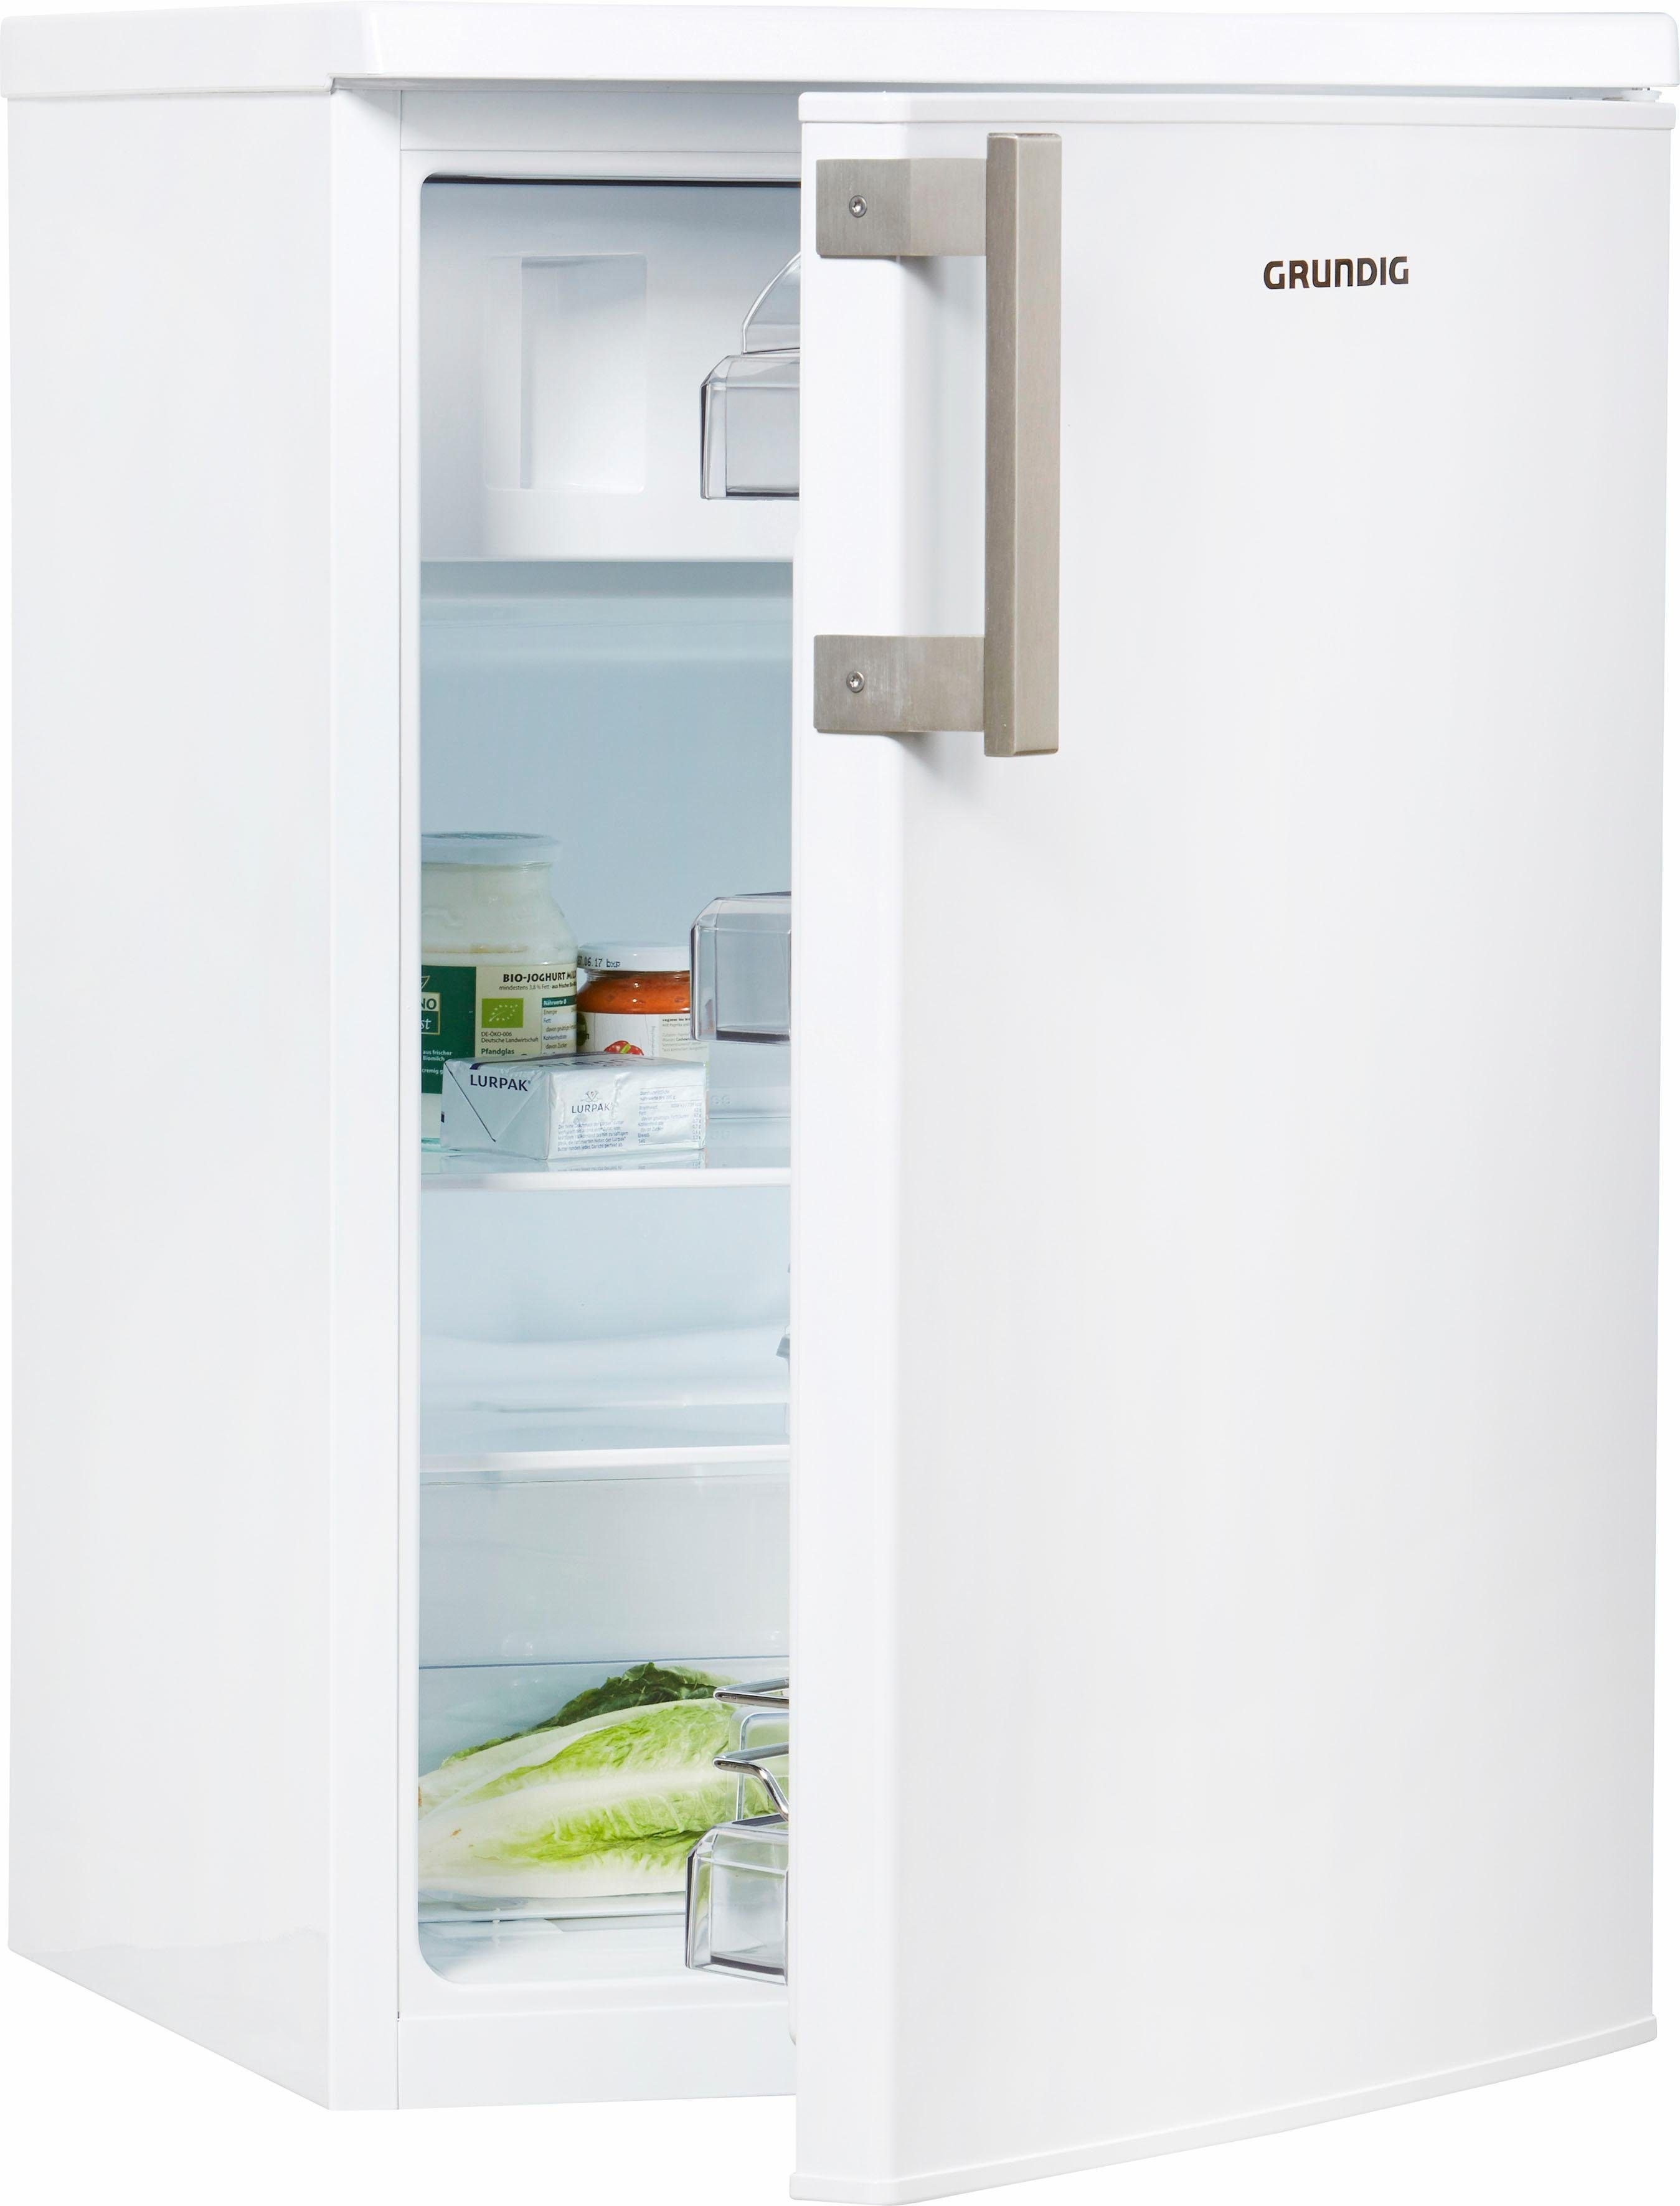 Grundig Kühlschrank GTM 14130, 84 cm hoch, 54,5 cm breit, A+++, 84 cm hoch